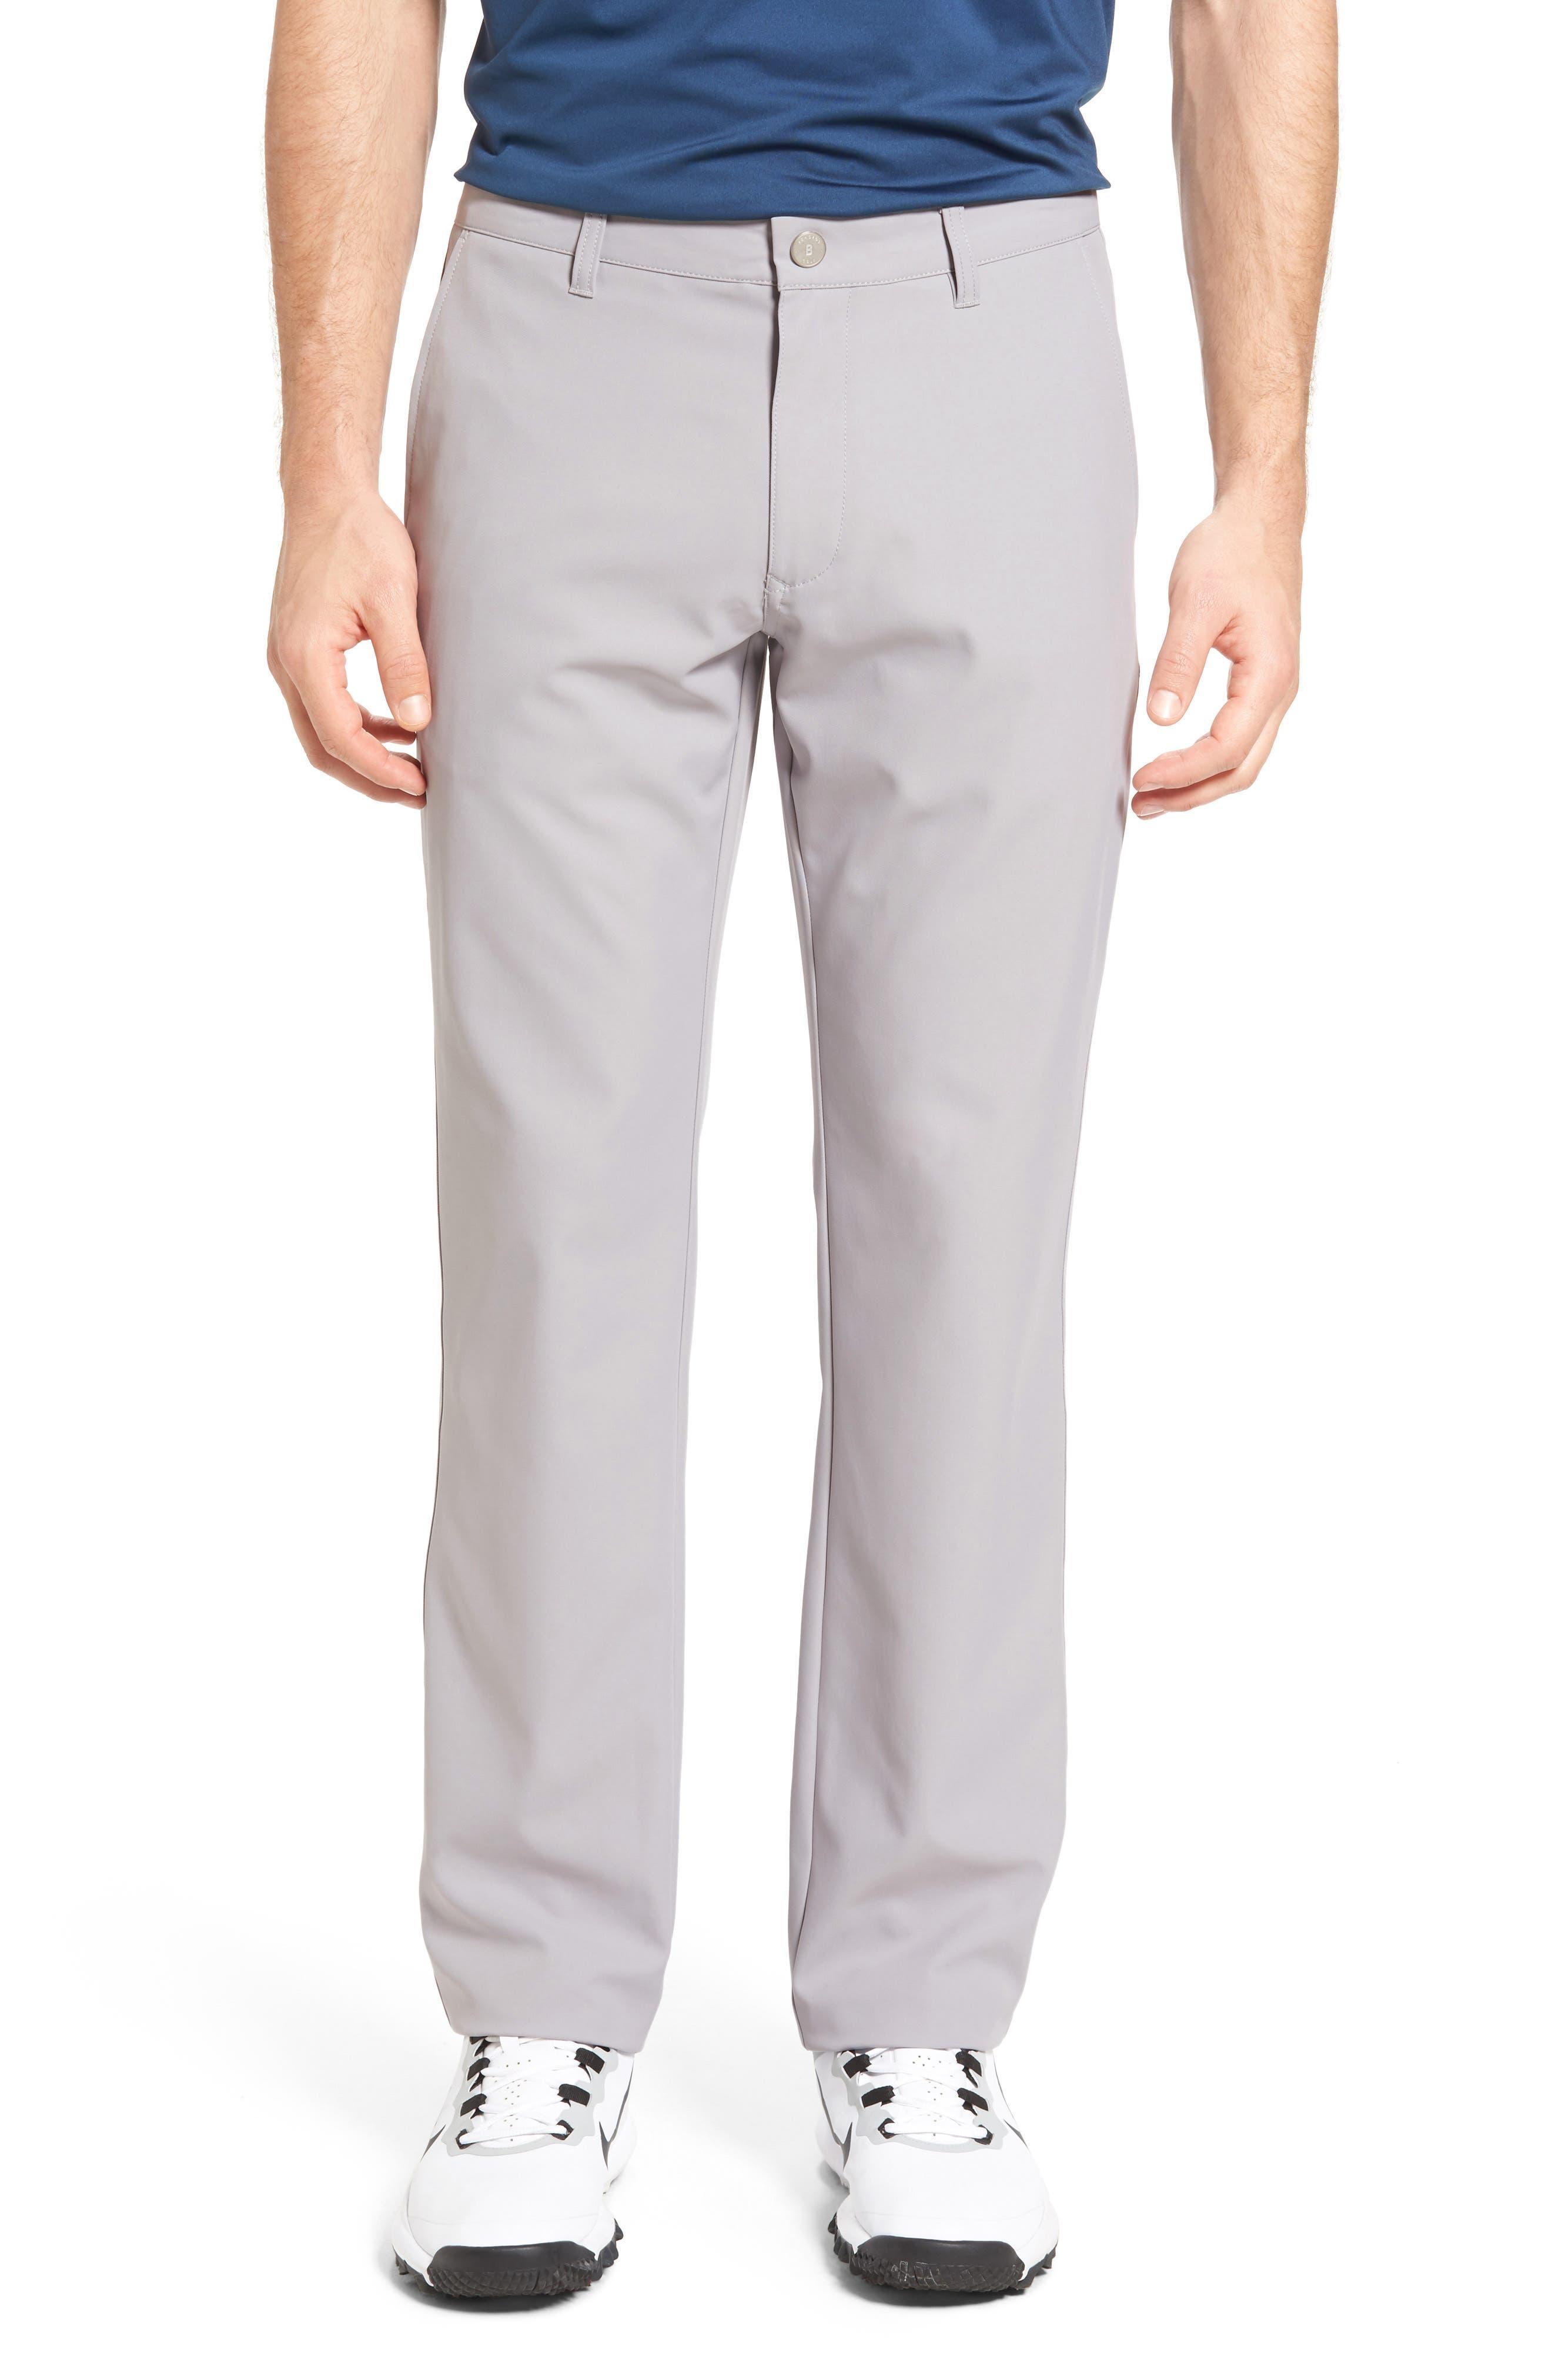 Highland Slim Fit Golf Pants,                         Main,                         color, LIGHT GREY